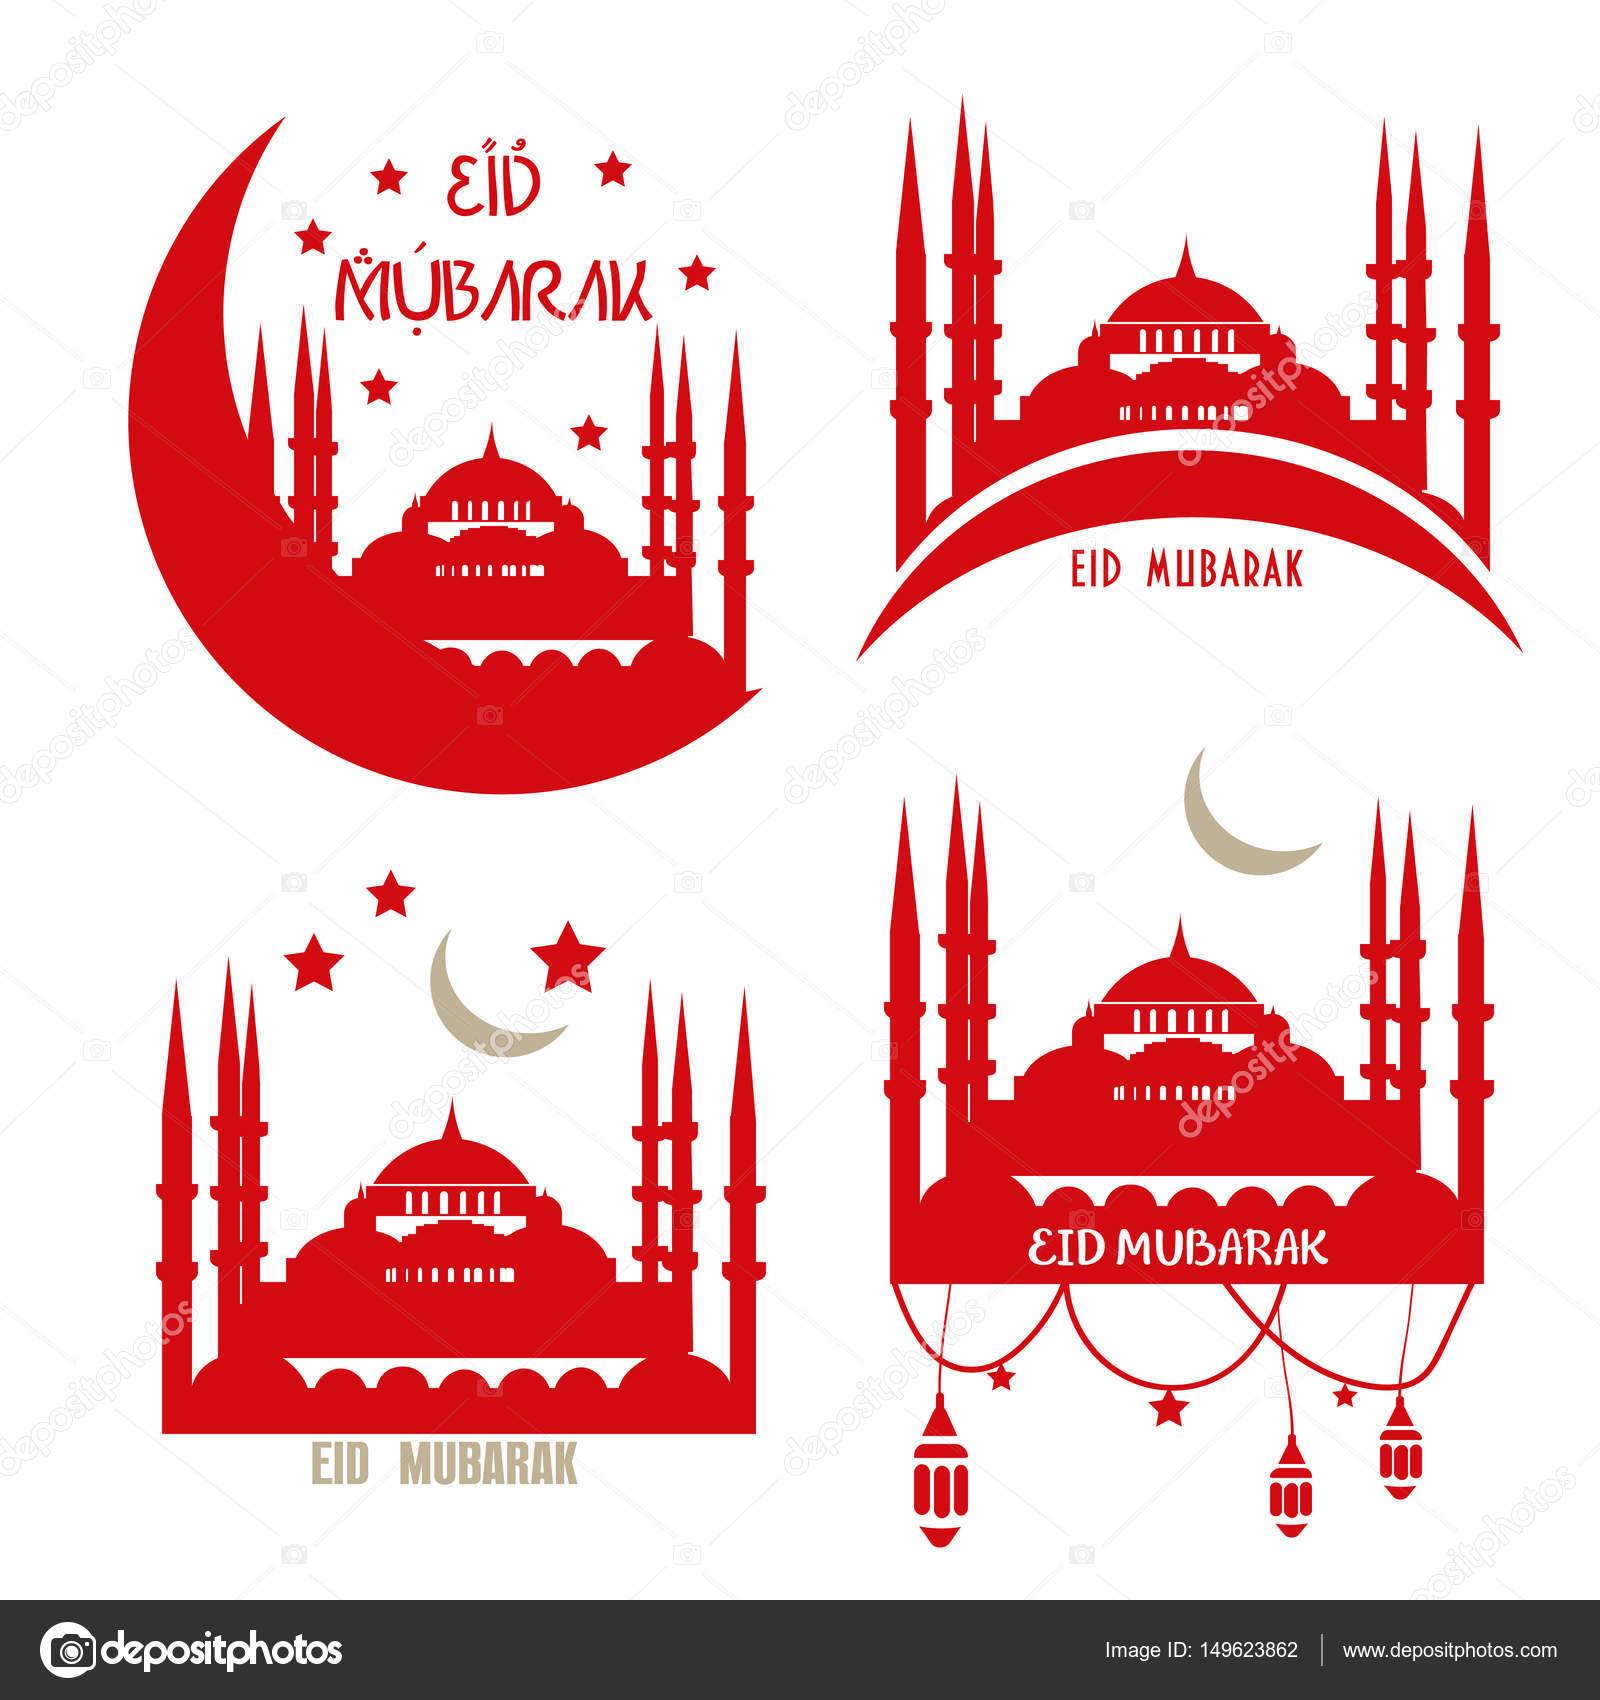 Good Id Festival Eid Al-Fitr Greeting - depositphotos_149623862-stock-illustration-set-of-vector-greeting-cards  Collection_861528 .jpg